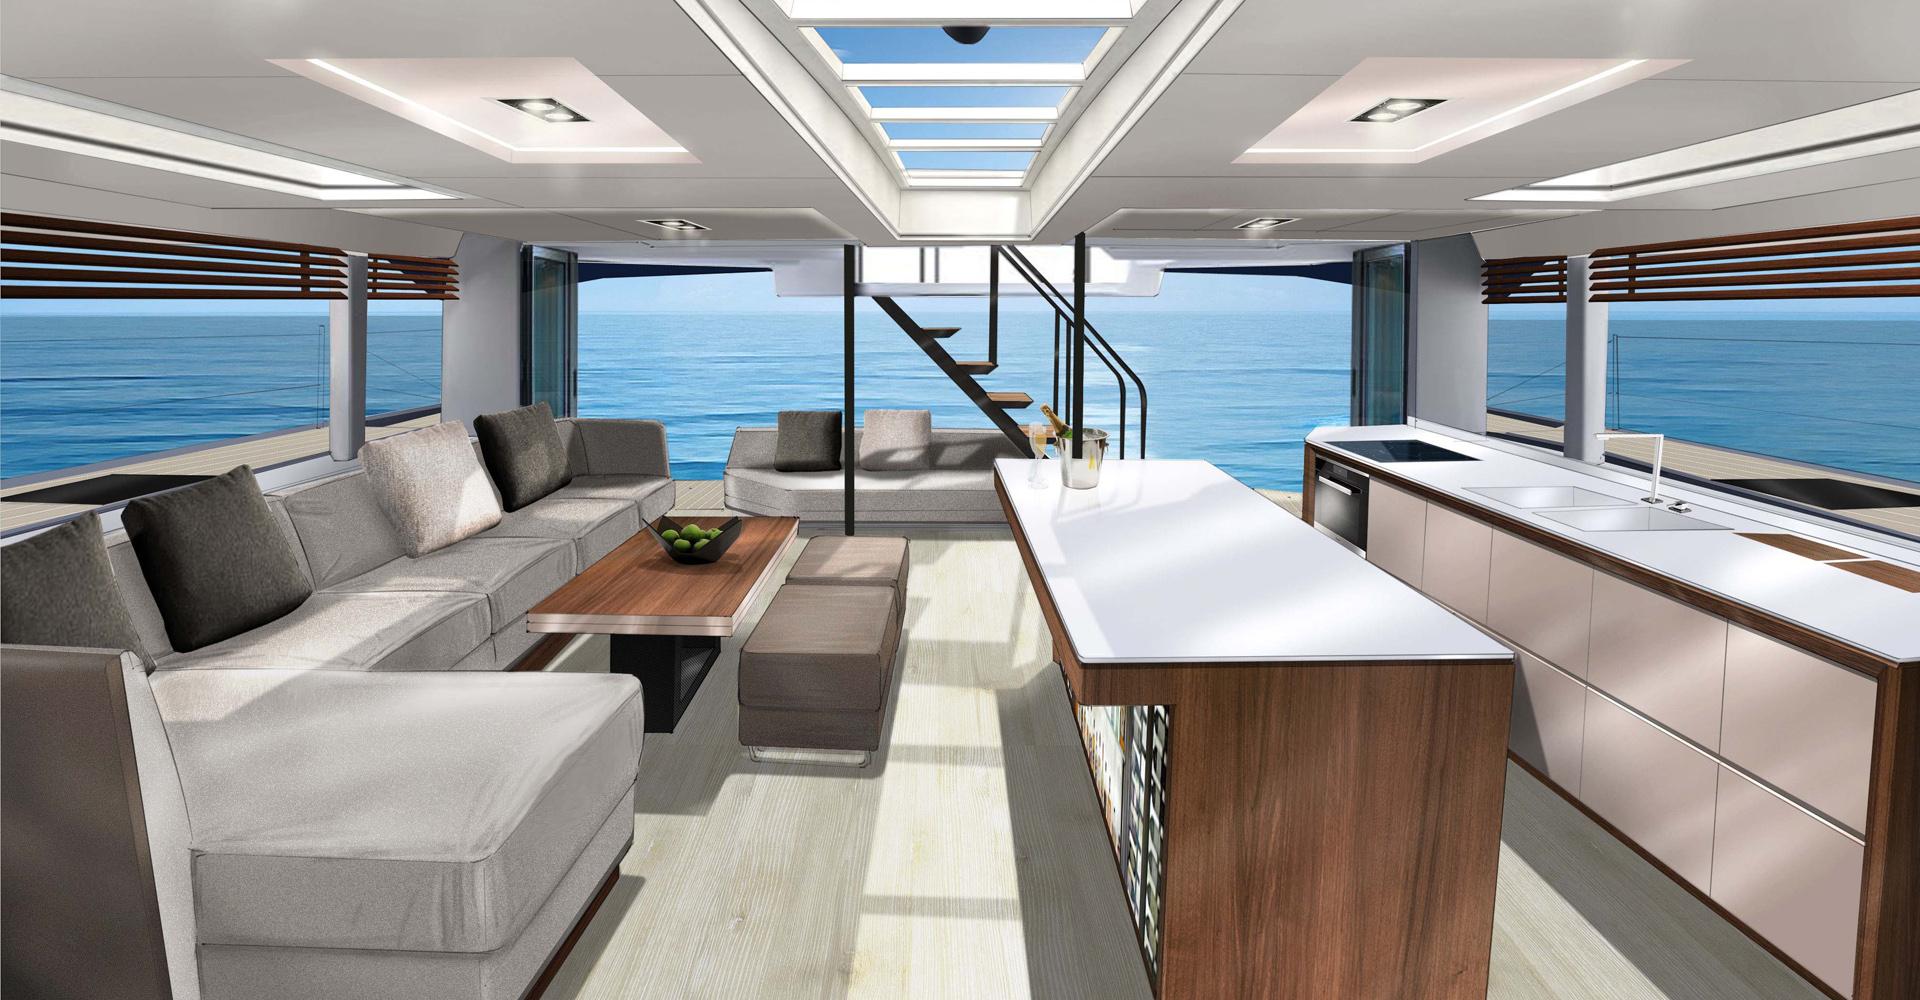 Interior design for the McConaghy catamaran range